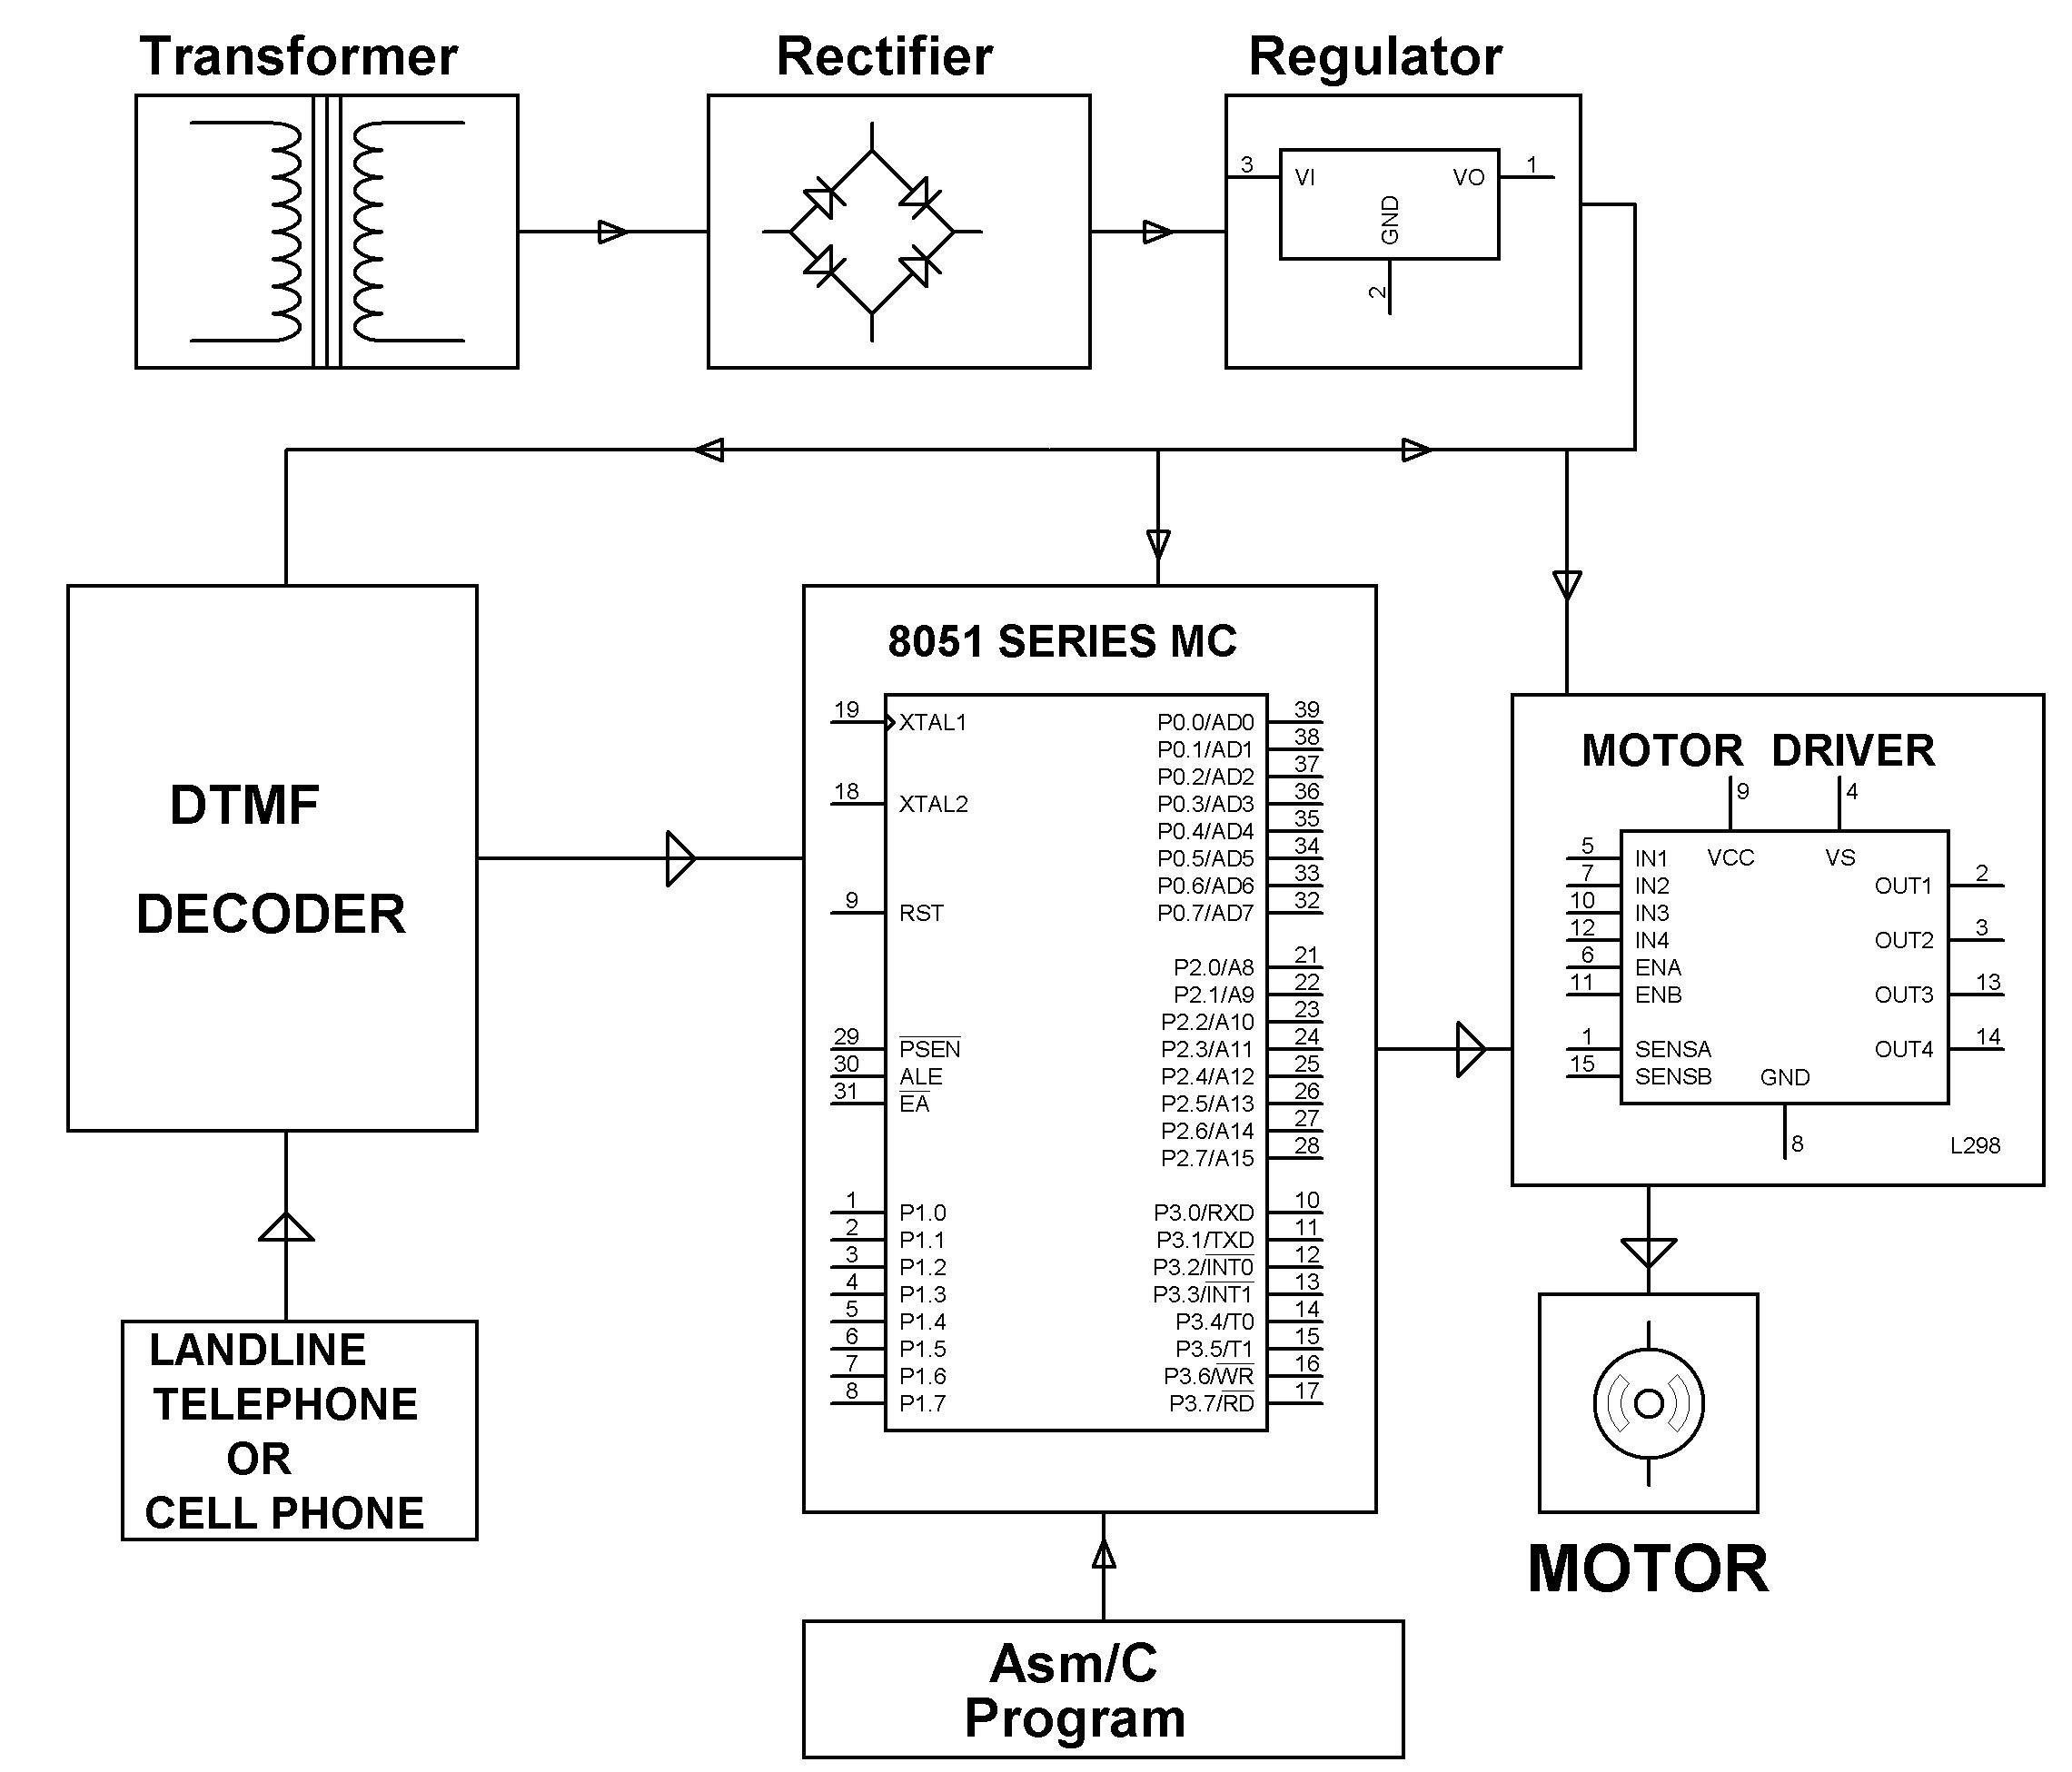 hight resolution of garage door opener control diagrams wiring diagram expert block diagram of dtmf control based automatic garage